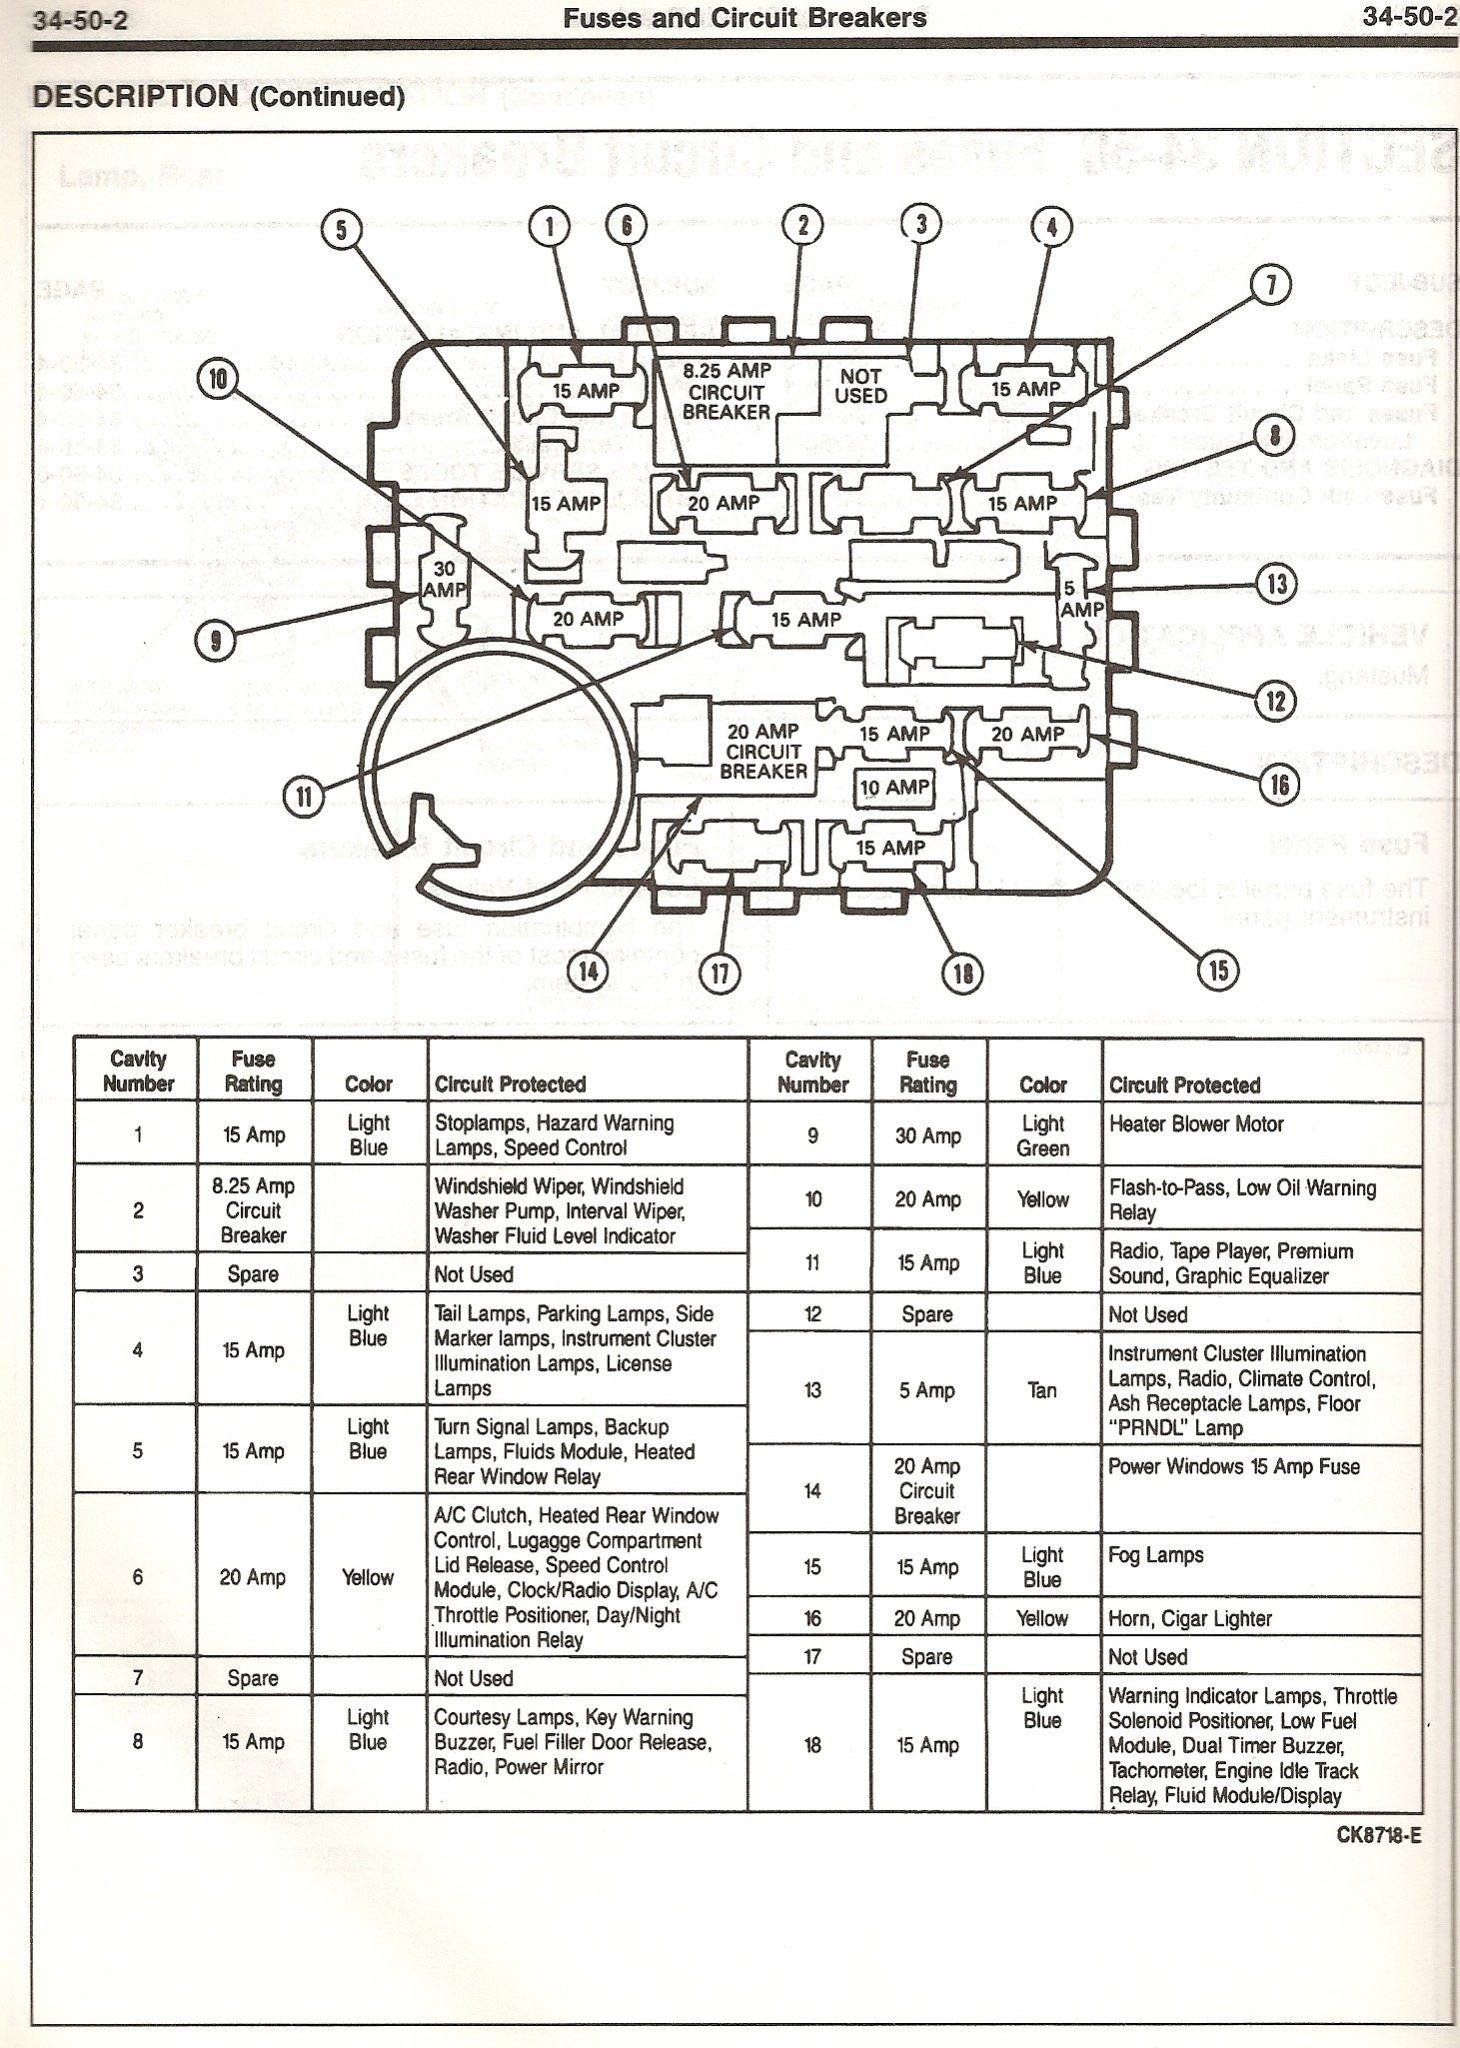 1988 F250 Fuse Box Diagram - Wiring Diagrams  Ford Mustang Fuse Box Diagram on 2006 ford van fuse box diagram, 95 mazda b4000 fuse box diagram, 94 mustang fuse panel diagram, 1996 mercury grand marquis fuse box diagram, 95 mustang fuse panel diagram, 95 honda civic dx fuse box diagram, 95 ford f-150 fuse box diagram, 95 ford mustang wiring, 1995 ford windstar fuse box diagram, 95 ford aerostar fuse box diagram, 95 gmc sierra 1500 fuse box diagram, 2006 ford f-250 fuse box diagram, 95 ford explorer fuse diagram, 1995 ford f-150 fuse diagram, 95 jeep grand cherokee fuse box diagram, 1995 mustang fuse diagram, 95 ford mustang tail lights, 95 ford contour fuse box diagram, 2003 ford escape fuse box diagram, 95 ford mustang fuel pump relay,